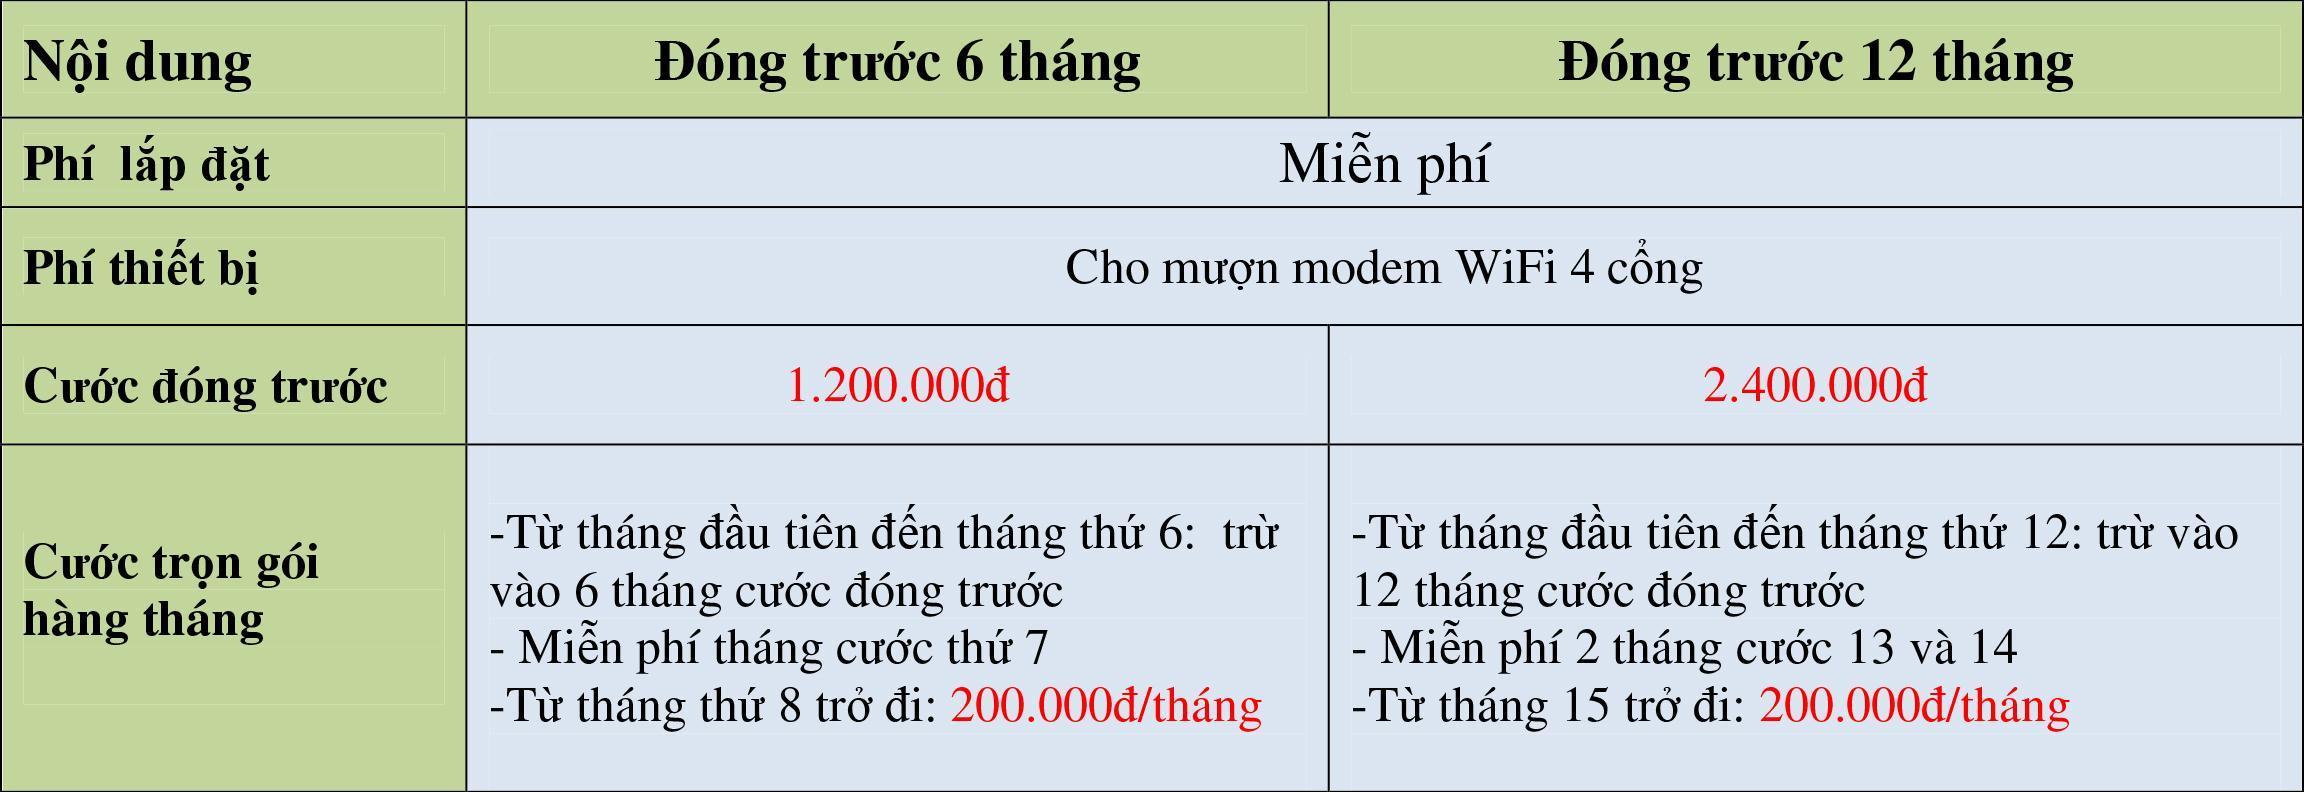 chuong-trinh-khuyen-mai-internet-viettel-tinh-dong-nai